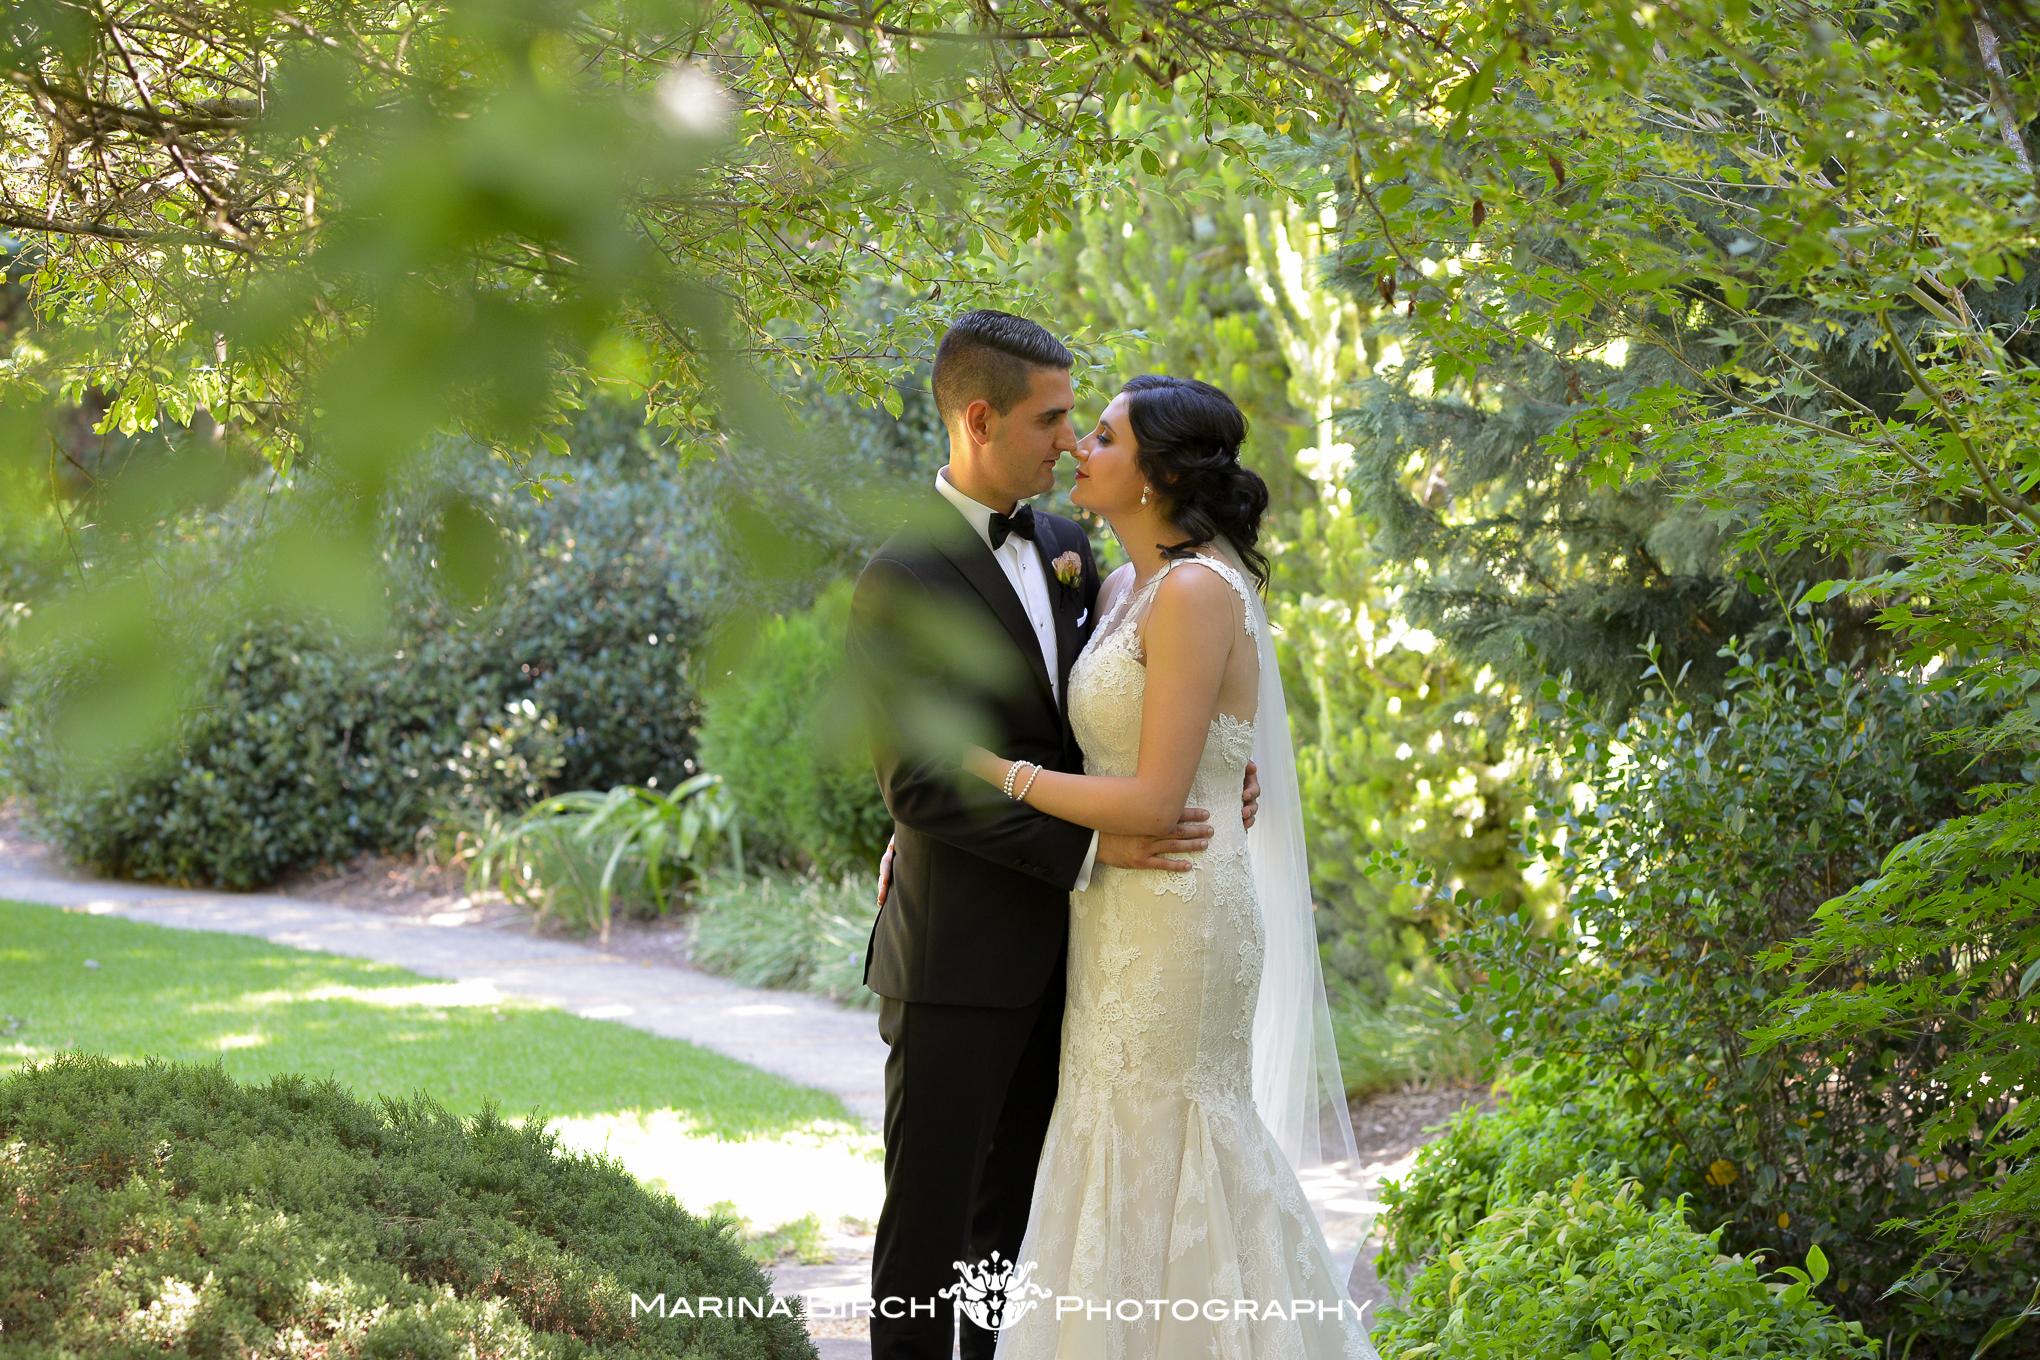 MBP.Lava wedding -18.jpg